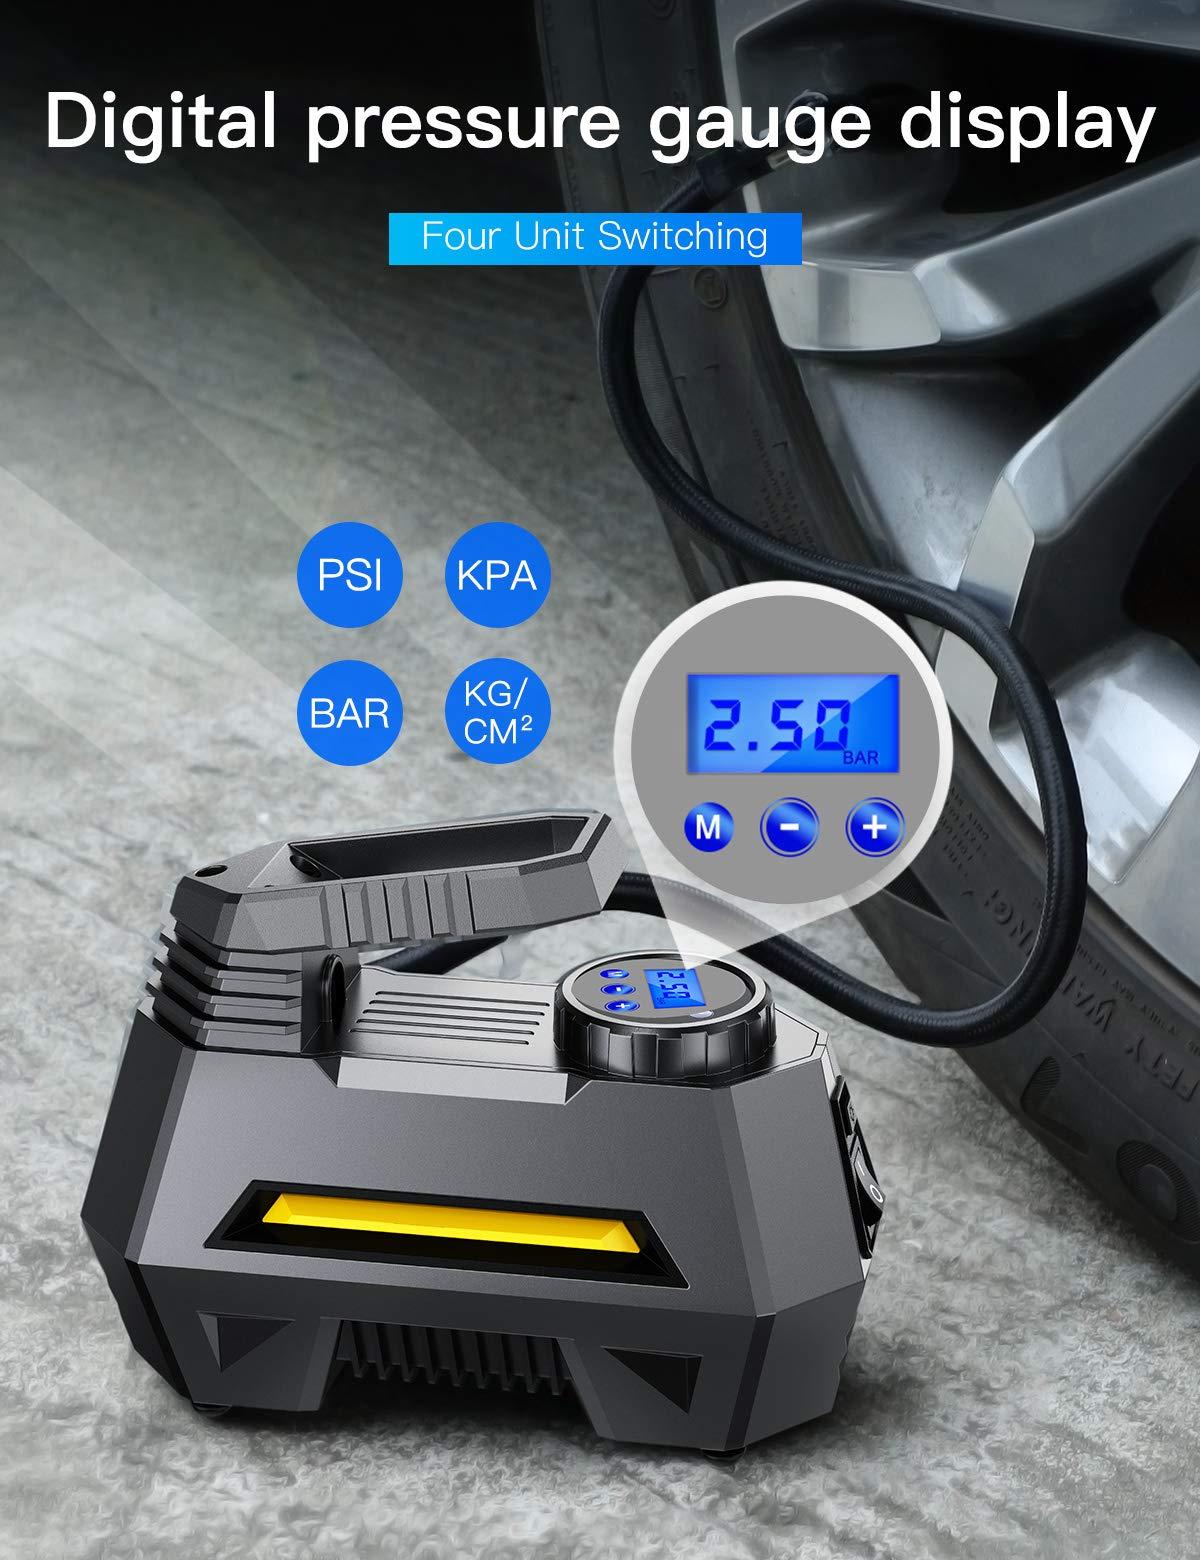 JOYROOM Portable Air Compressor Tire Inflator - Car Tire Pump with Digital Pressure Gauge (150 PSI 12V DC), Bright Emergency Flashlight - for Auto, Trucks, Bicycles, Balls by JOYROOM (Image #1)